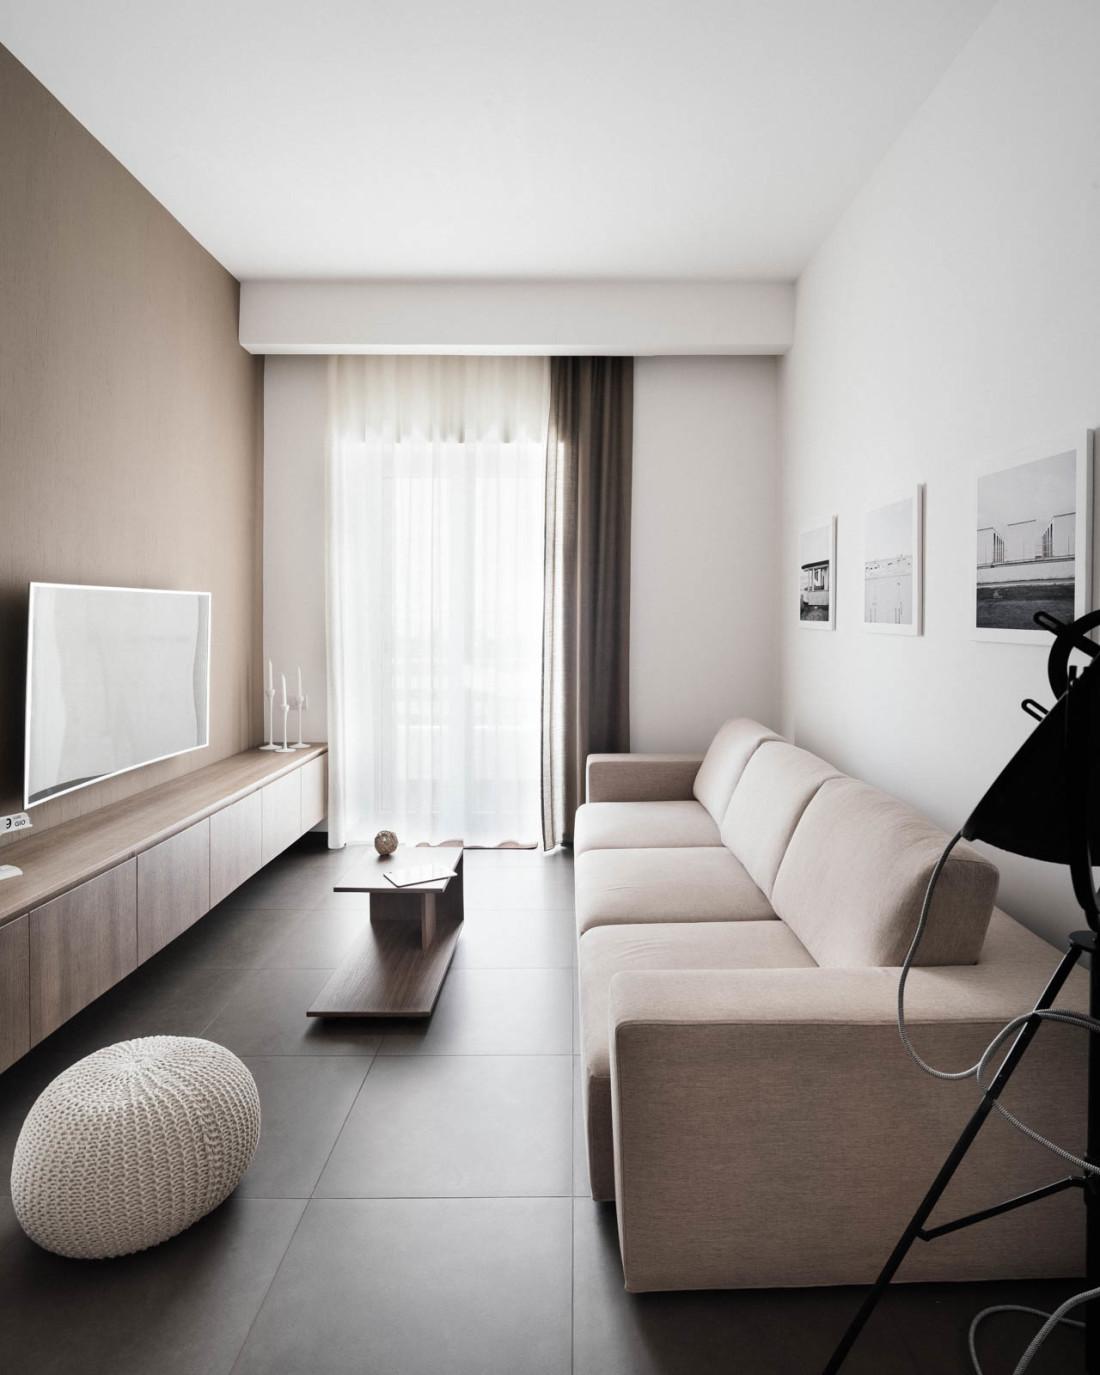 Architetto Napoli. Residenza A+R. Manuarino